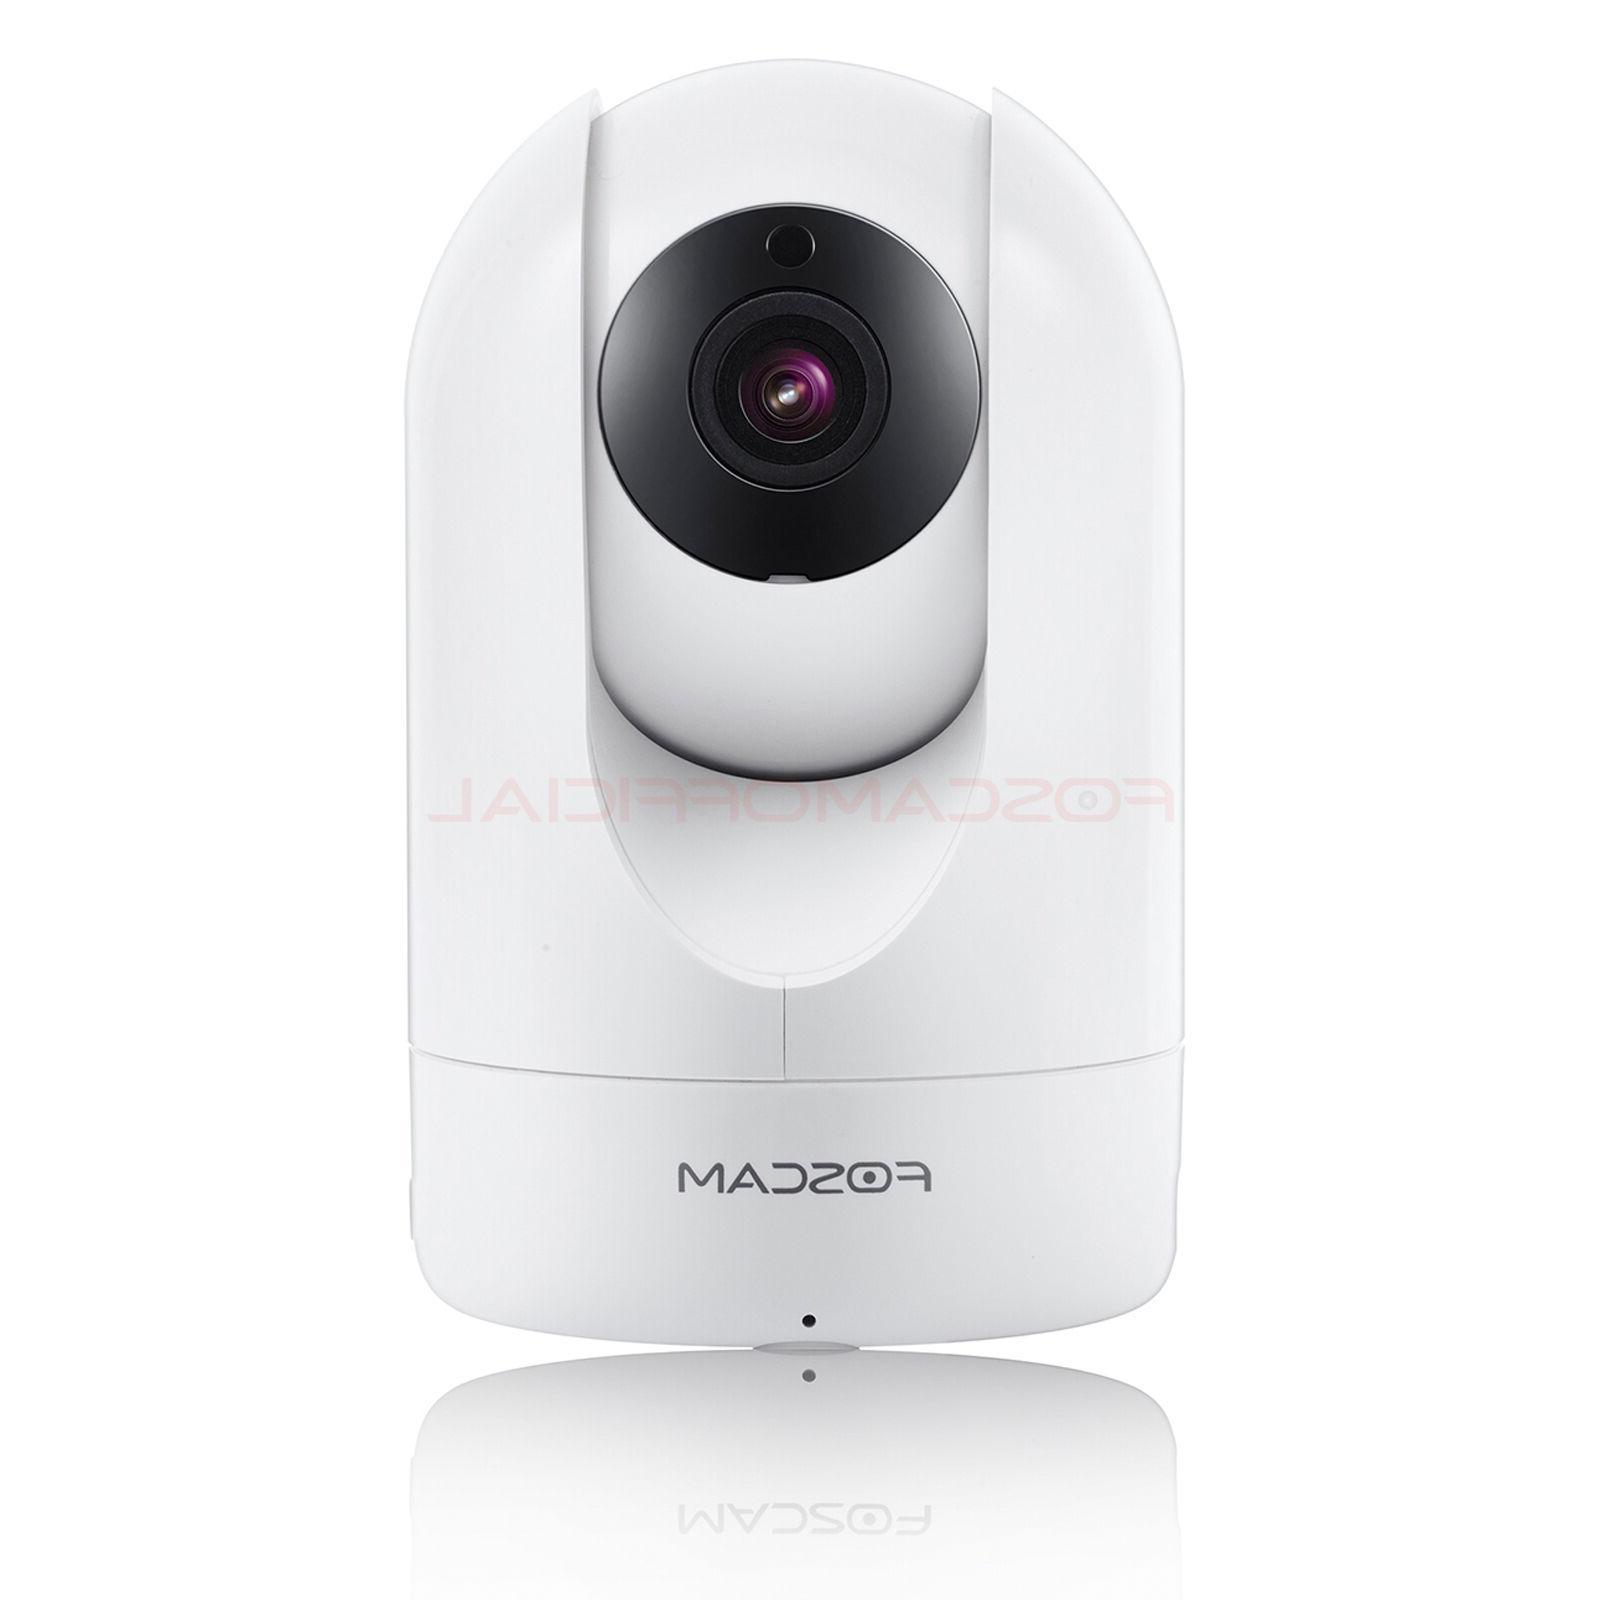 Foscam HD 1440P 4.0MP Pan Zoom Security IP